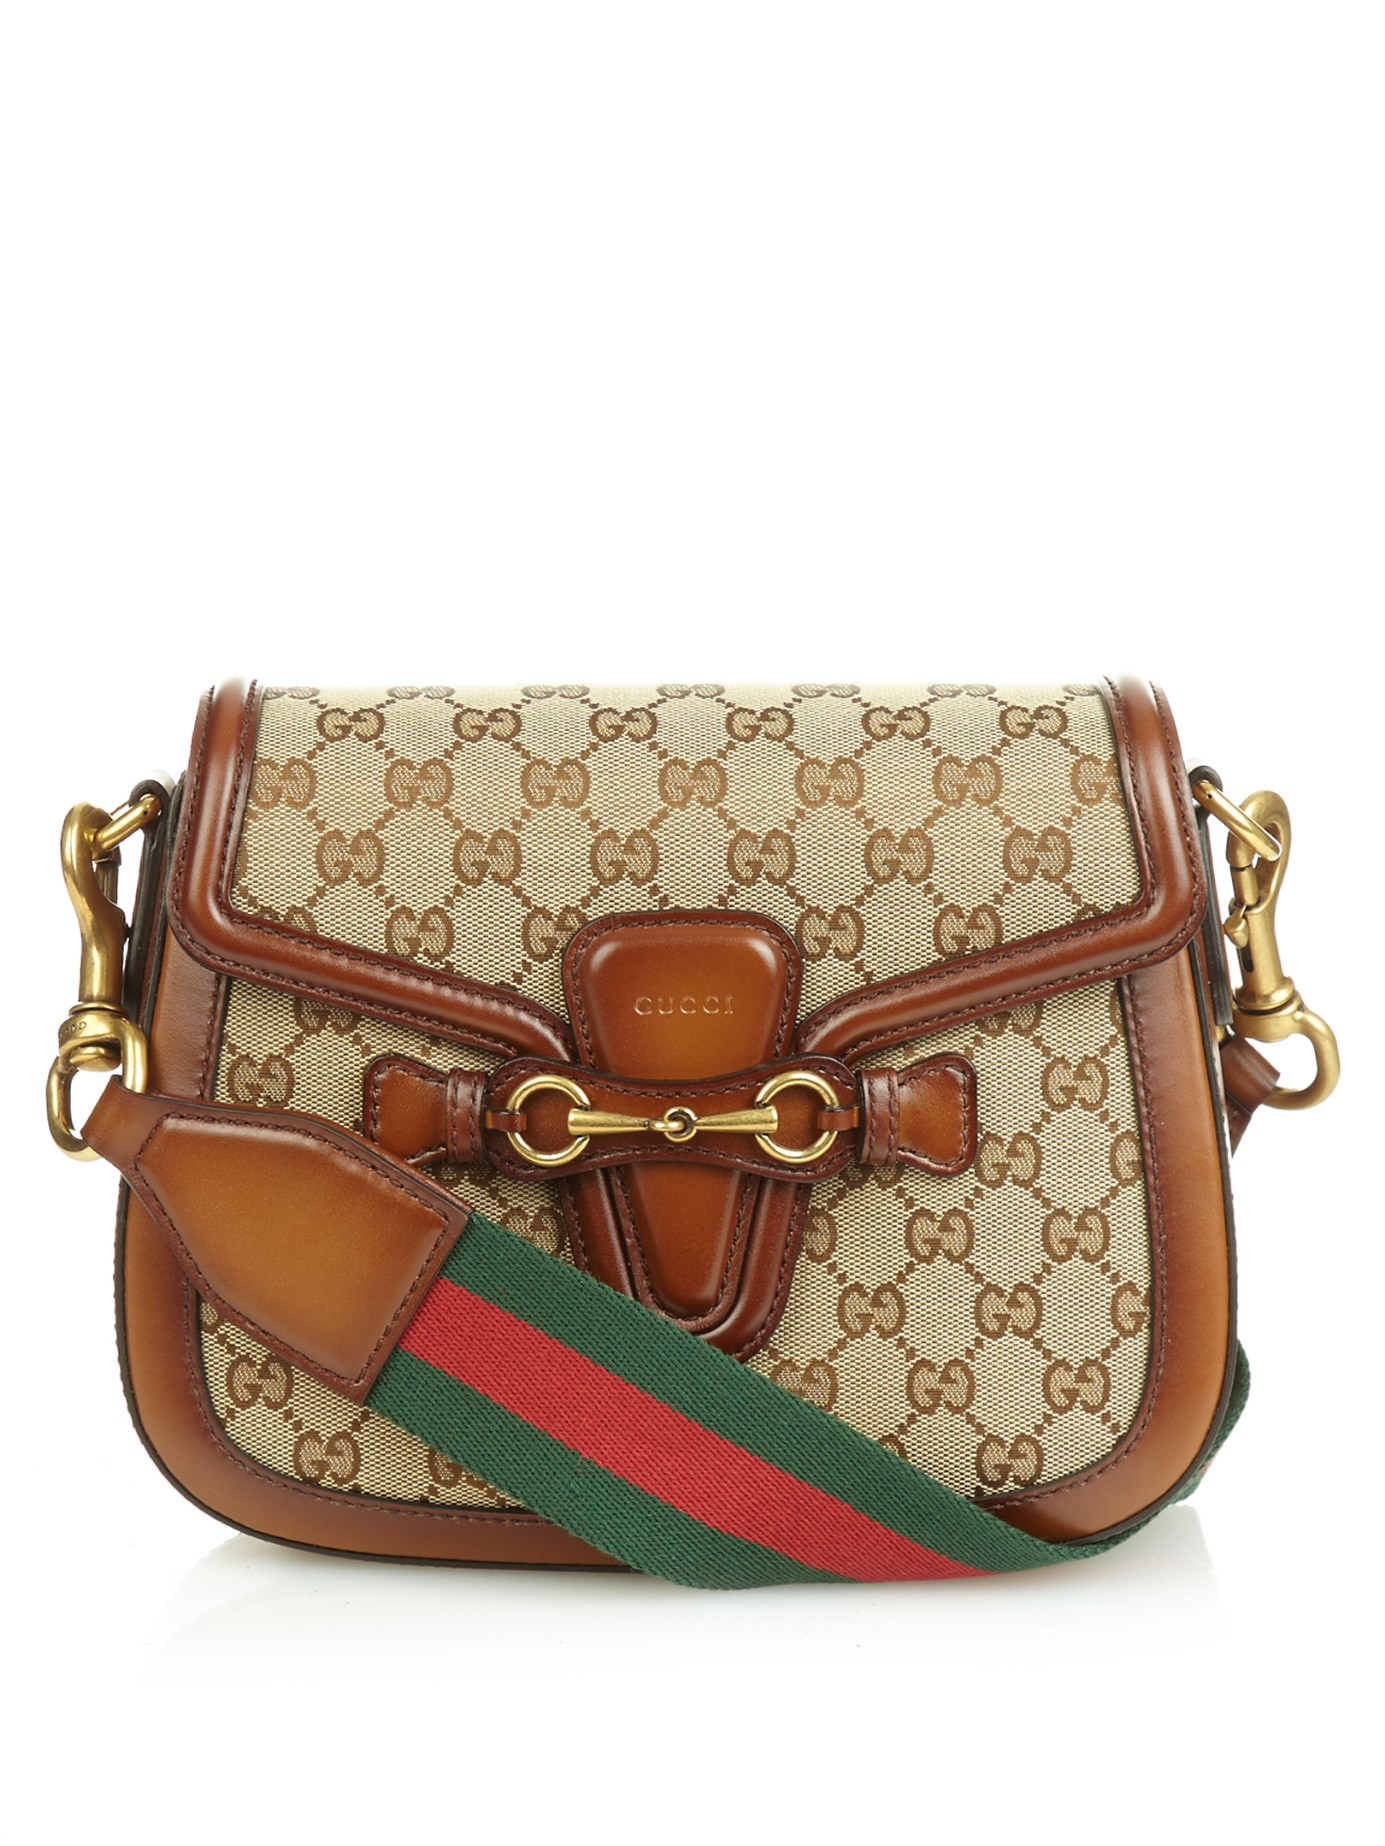 55787f7e463a Lyst - Gucci Lady Web Medium Shoulder Bag in Brown